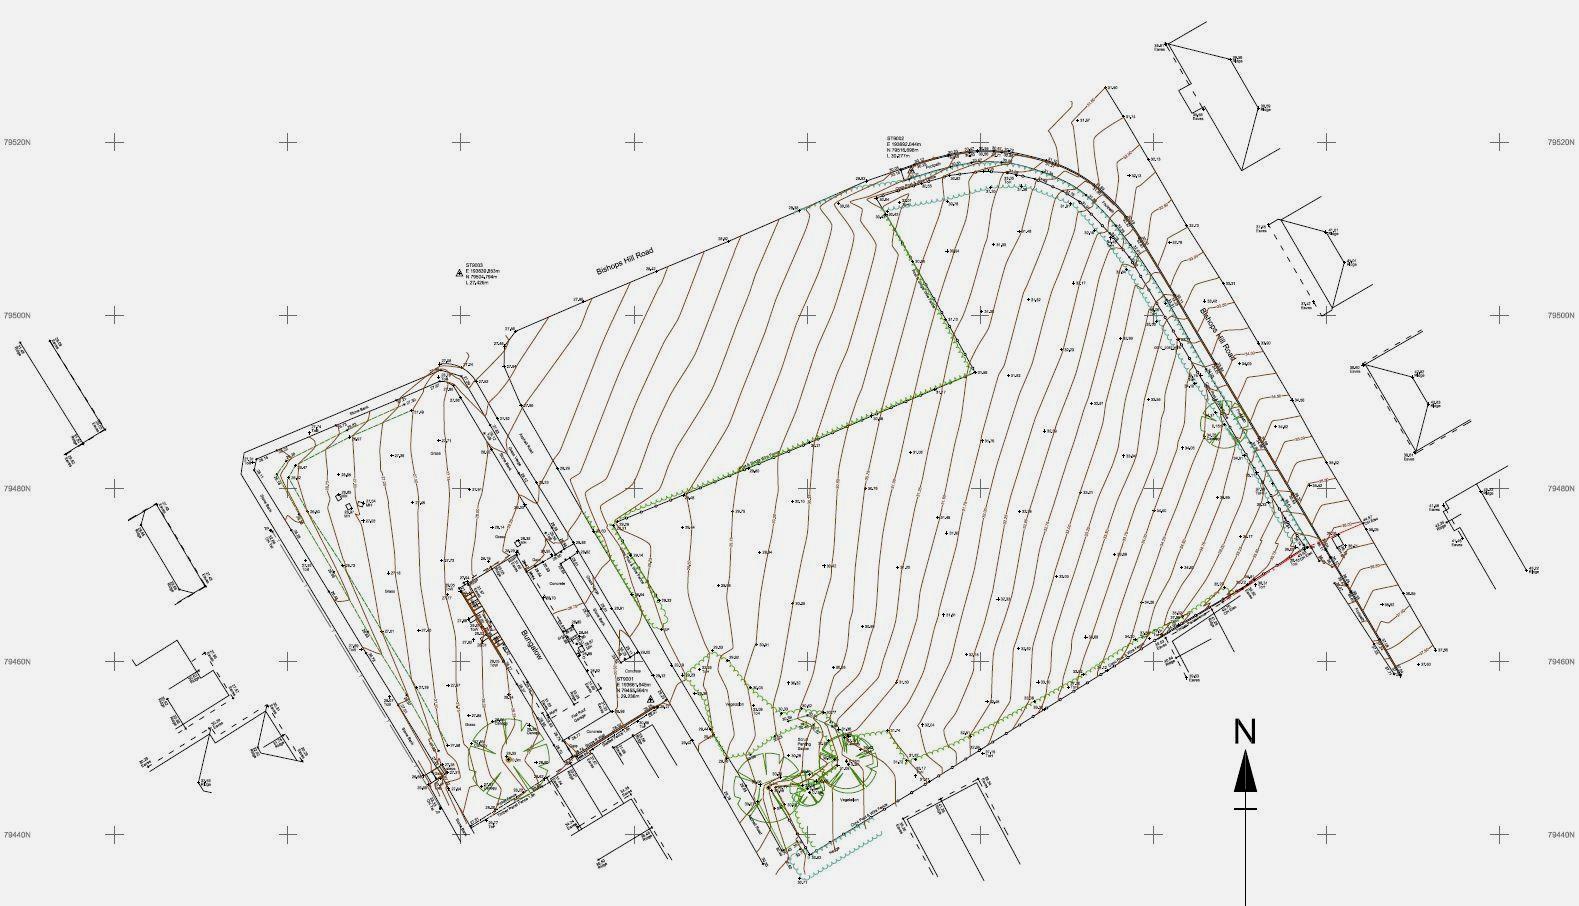 Topographical land survey, Polzeath, Cornwall